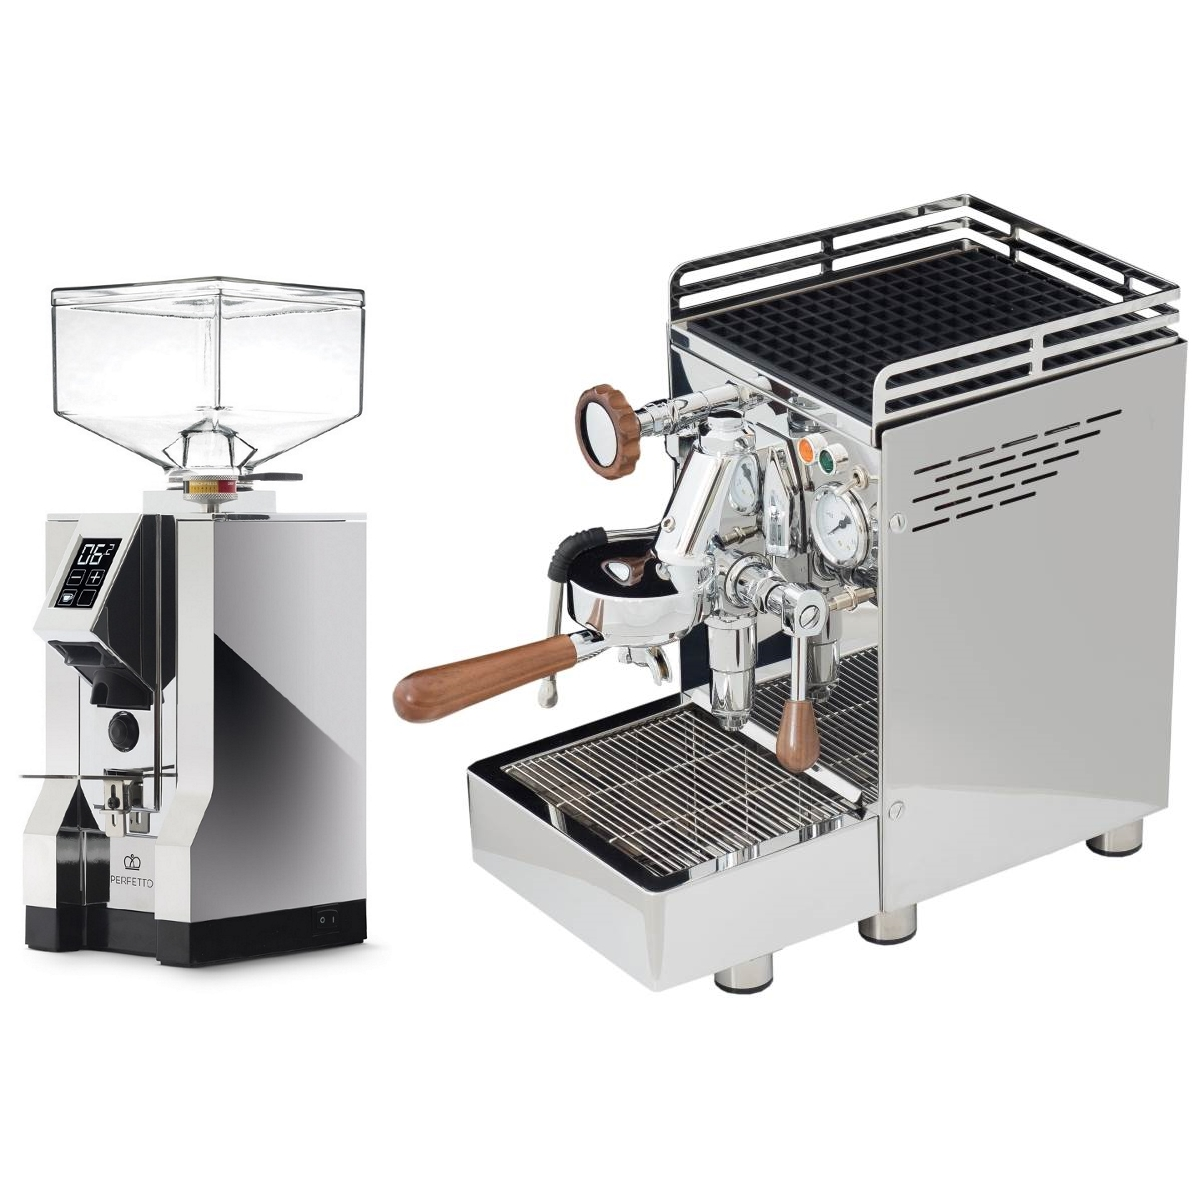 Macchina da caffè 969.coffee Elba3 + Macinacaffè Eureka Mignon Specialita' 16CR - Cromo